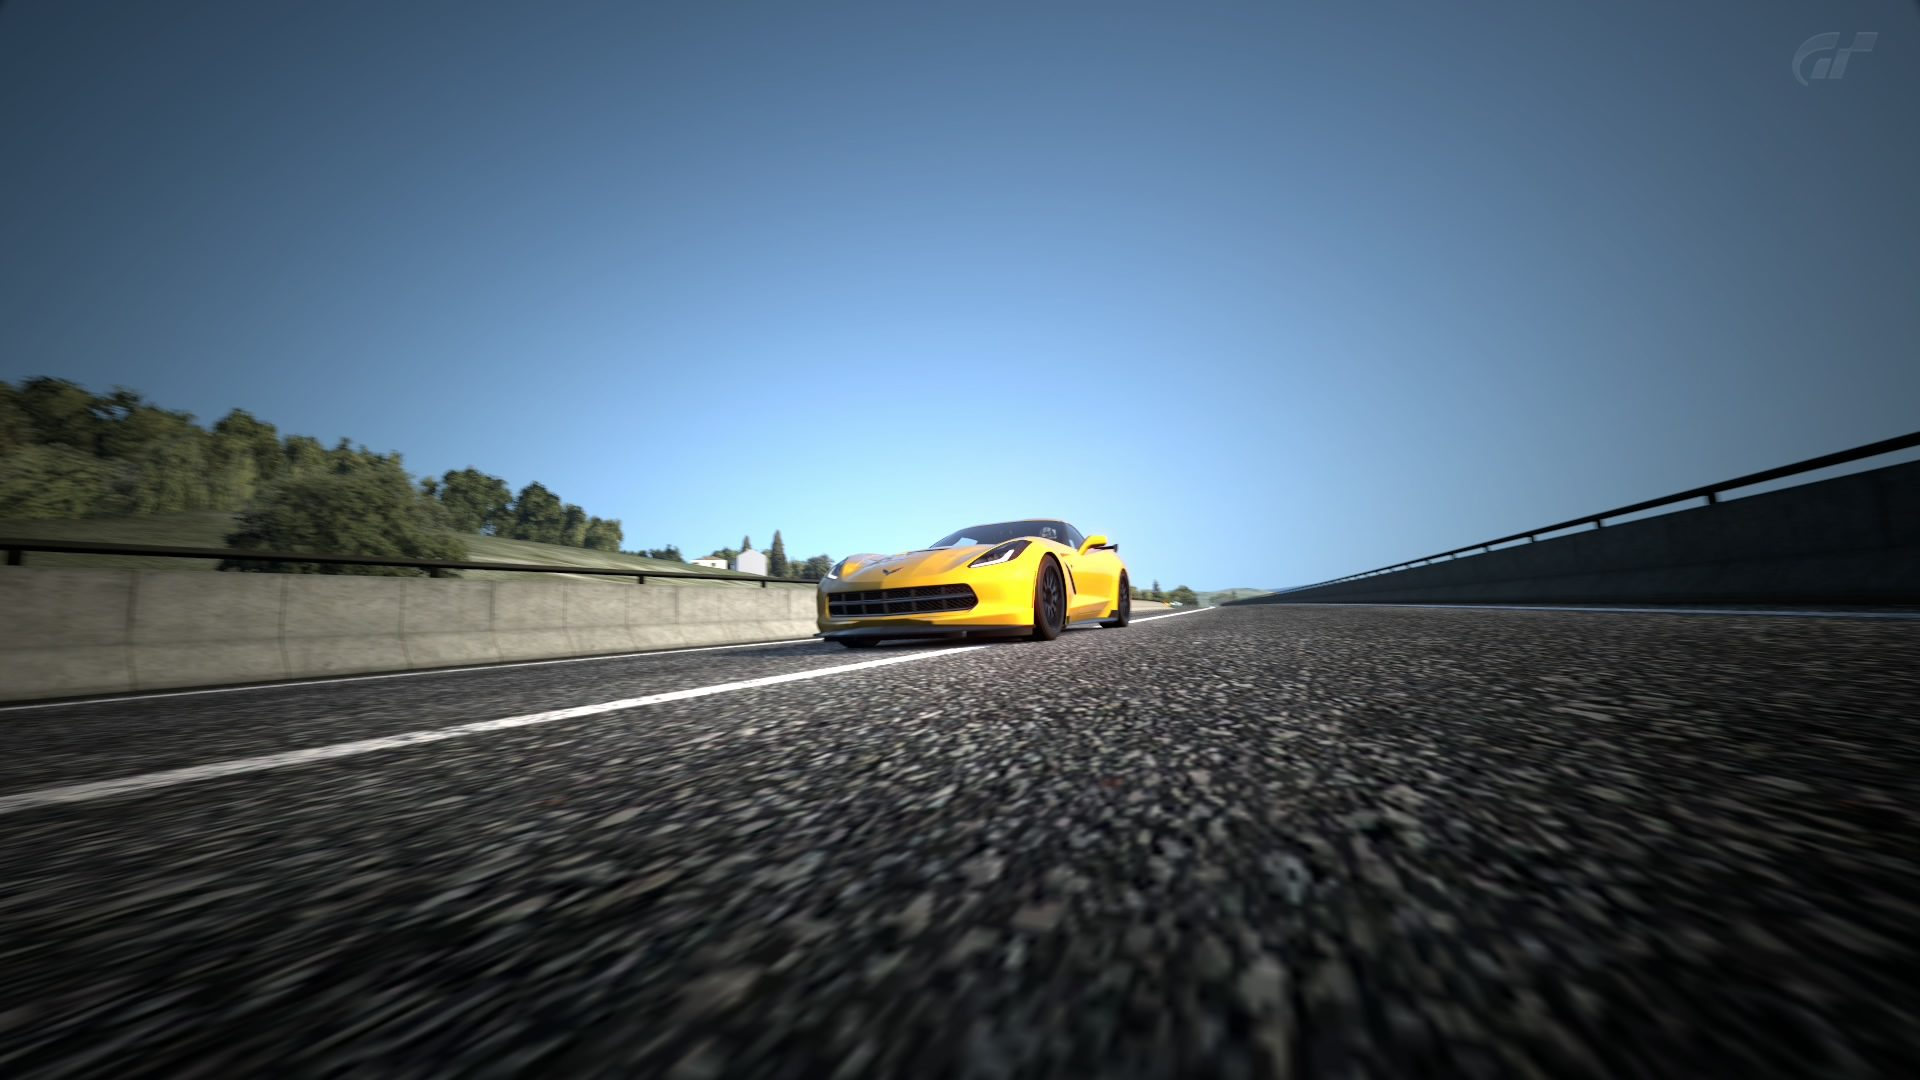 Circuito de la Sierra_6.jpg